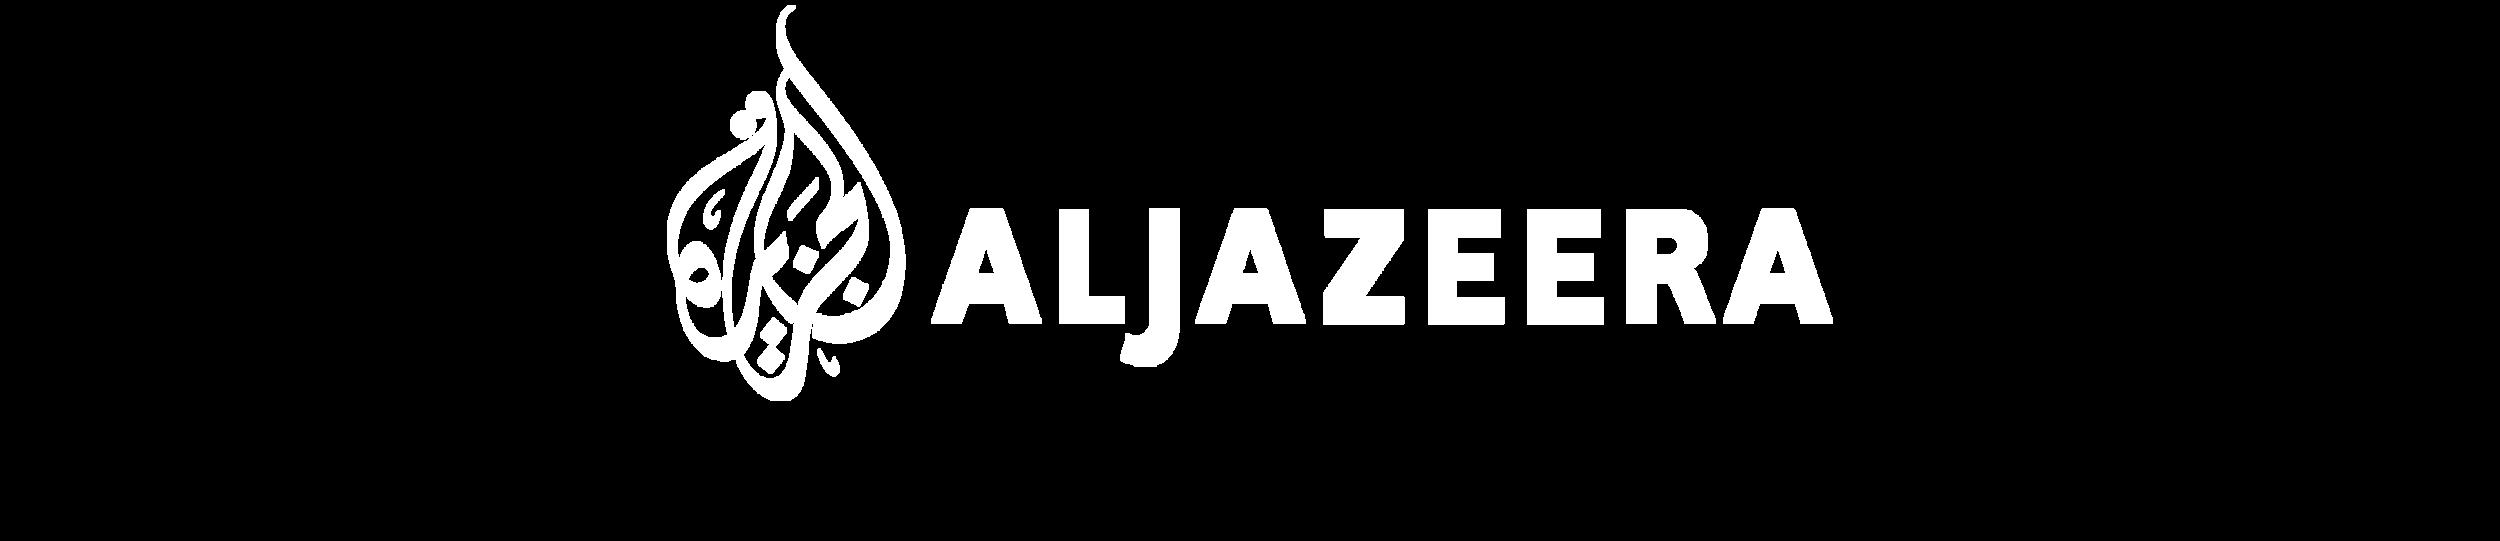 logo al jazeera.png